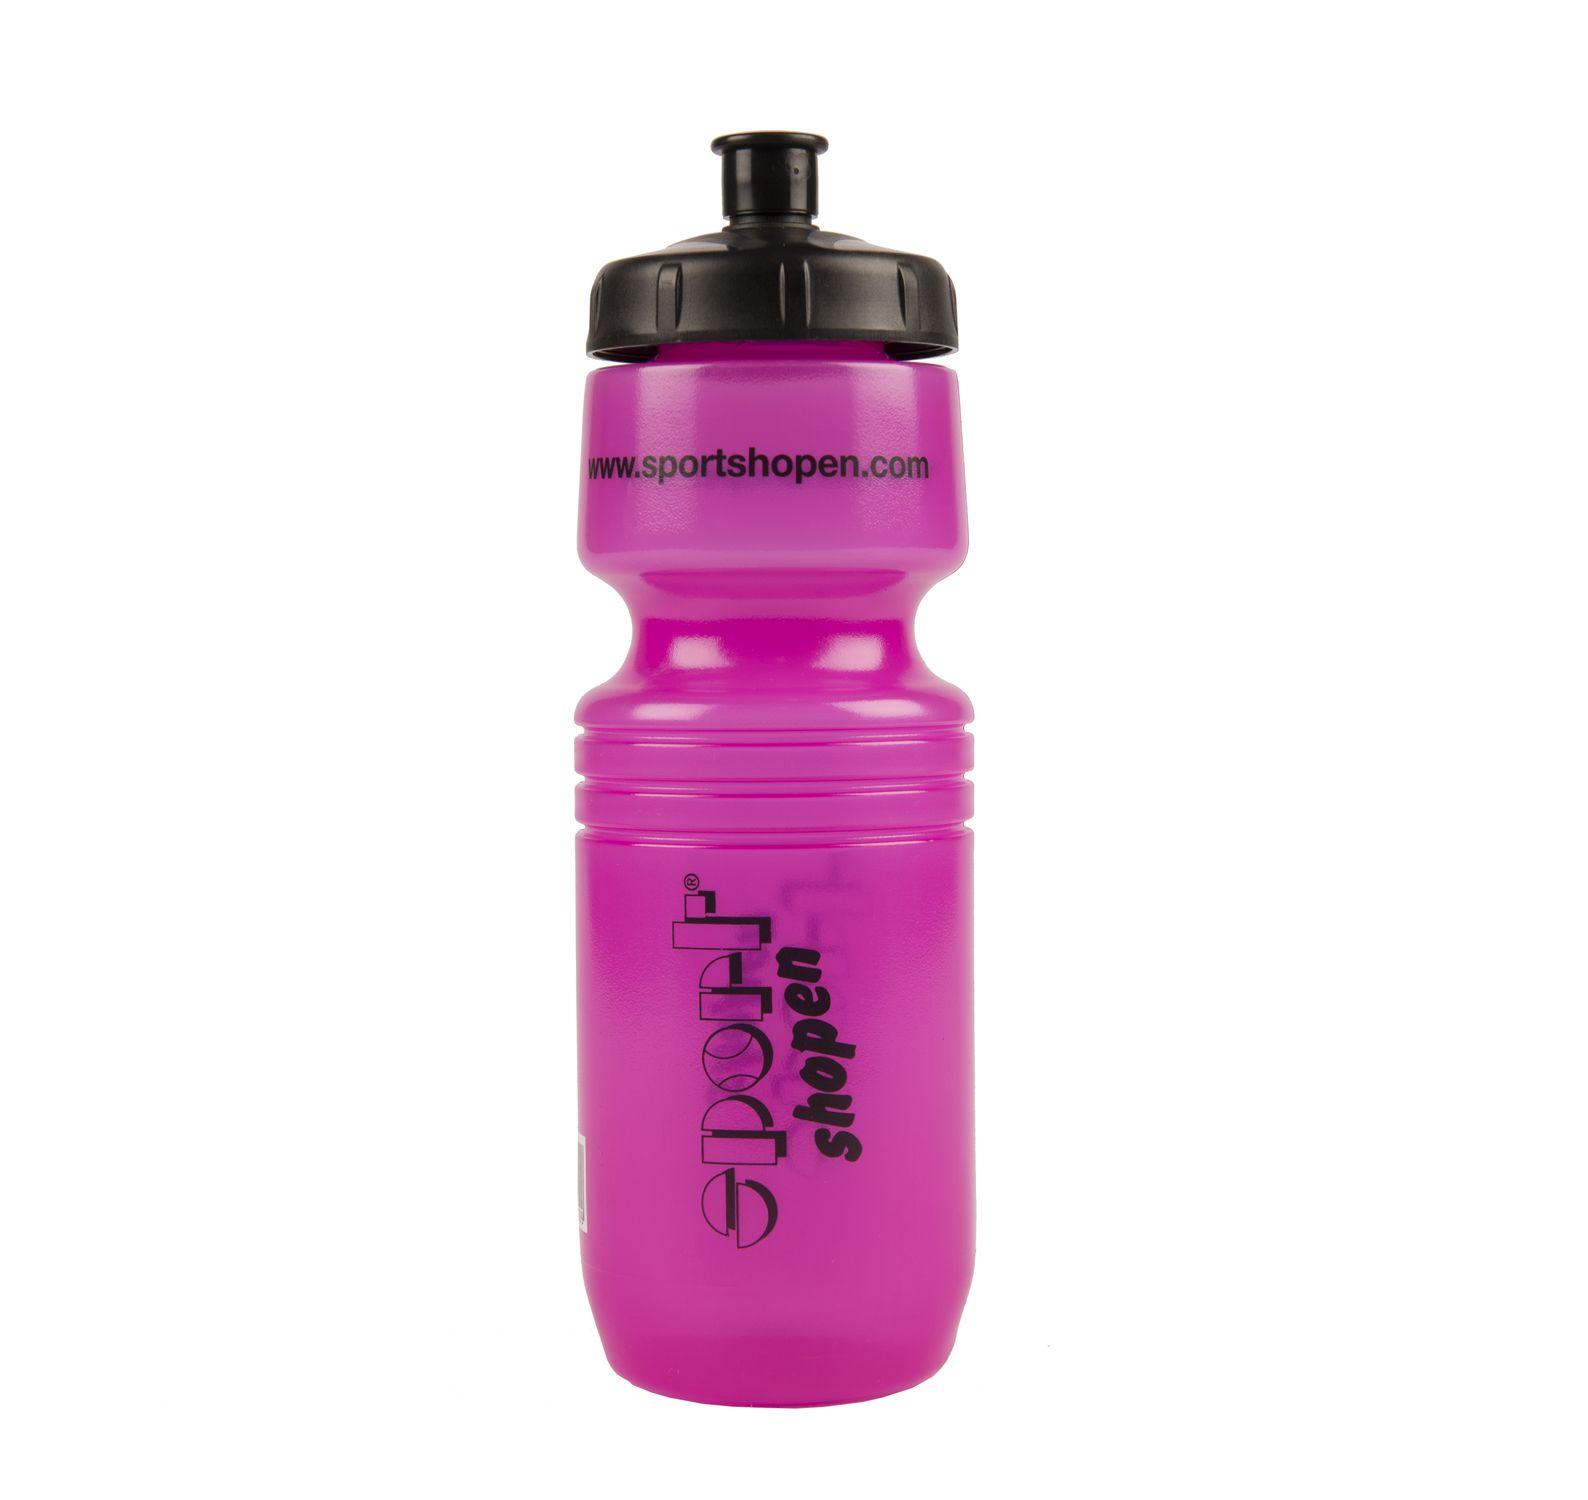 Sportshopen Bottle, Pink, Onesize, Swedemount